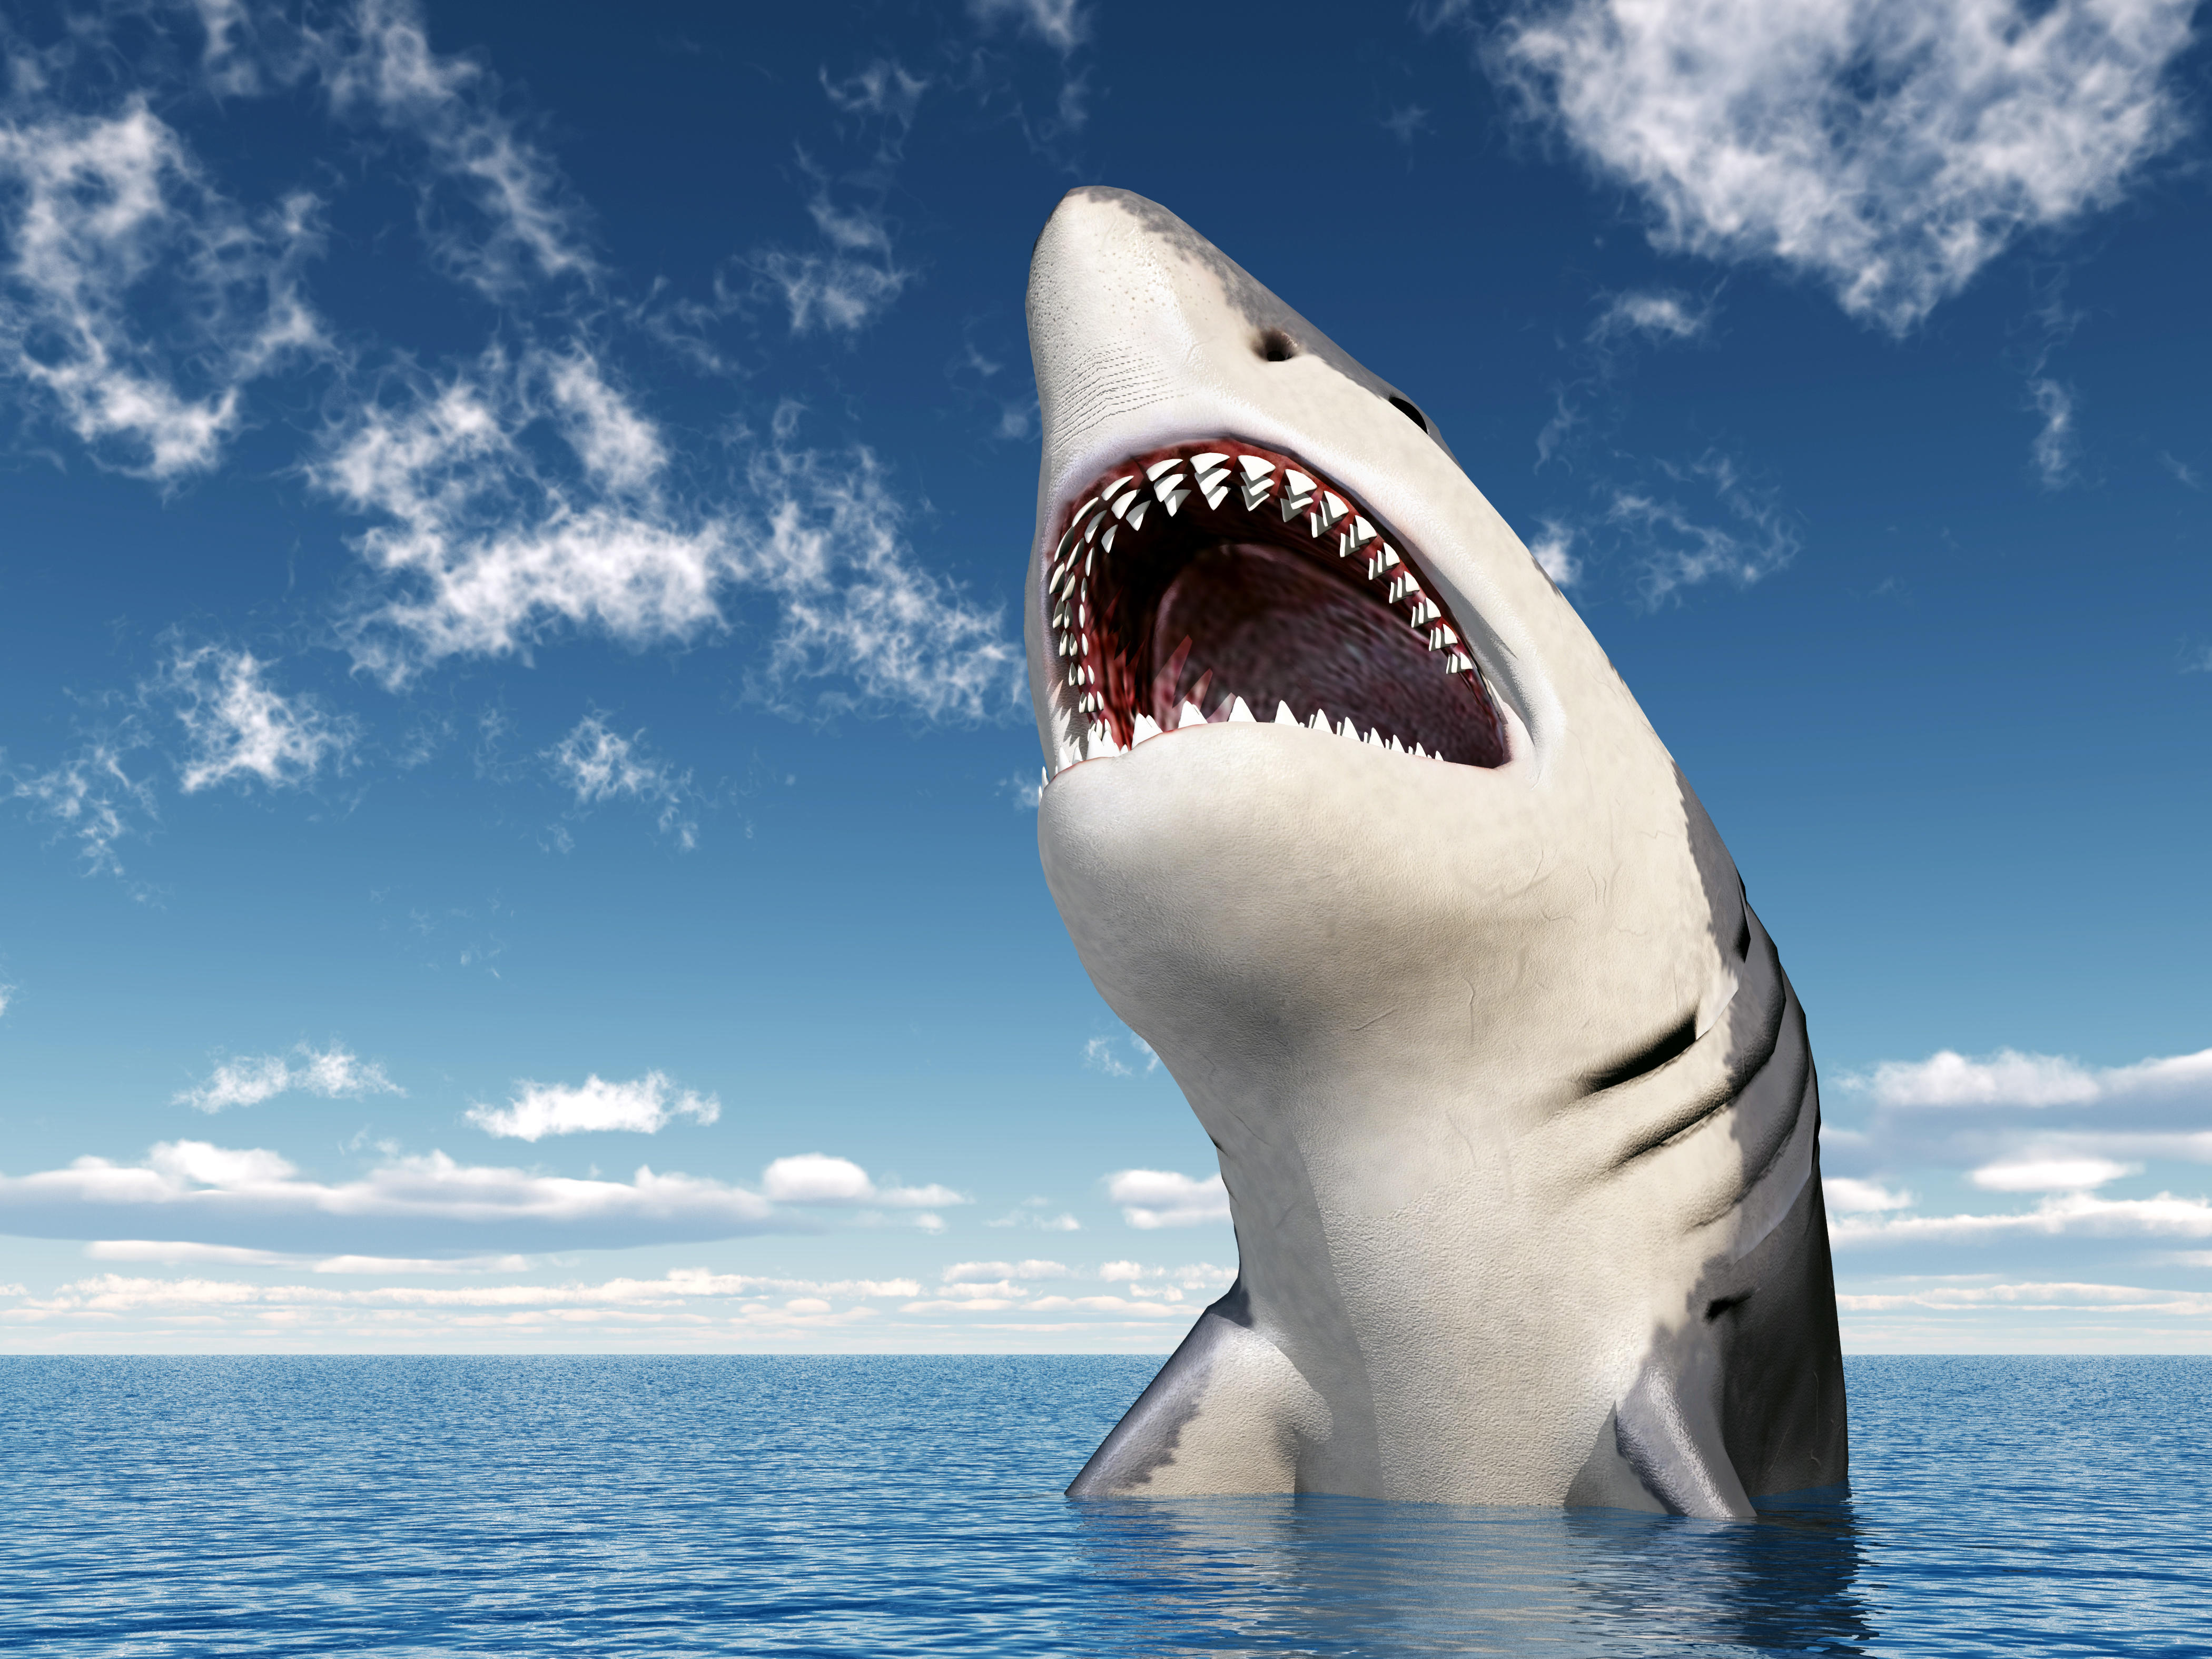 обои акула, хищник, оскал, опасность картинки фото